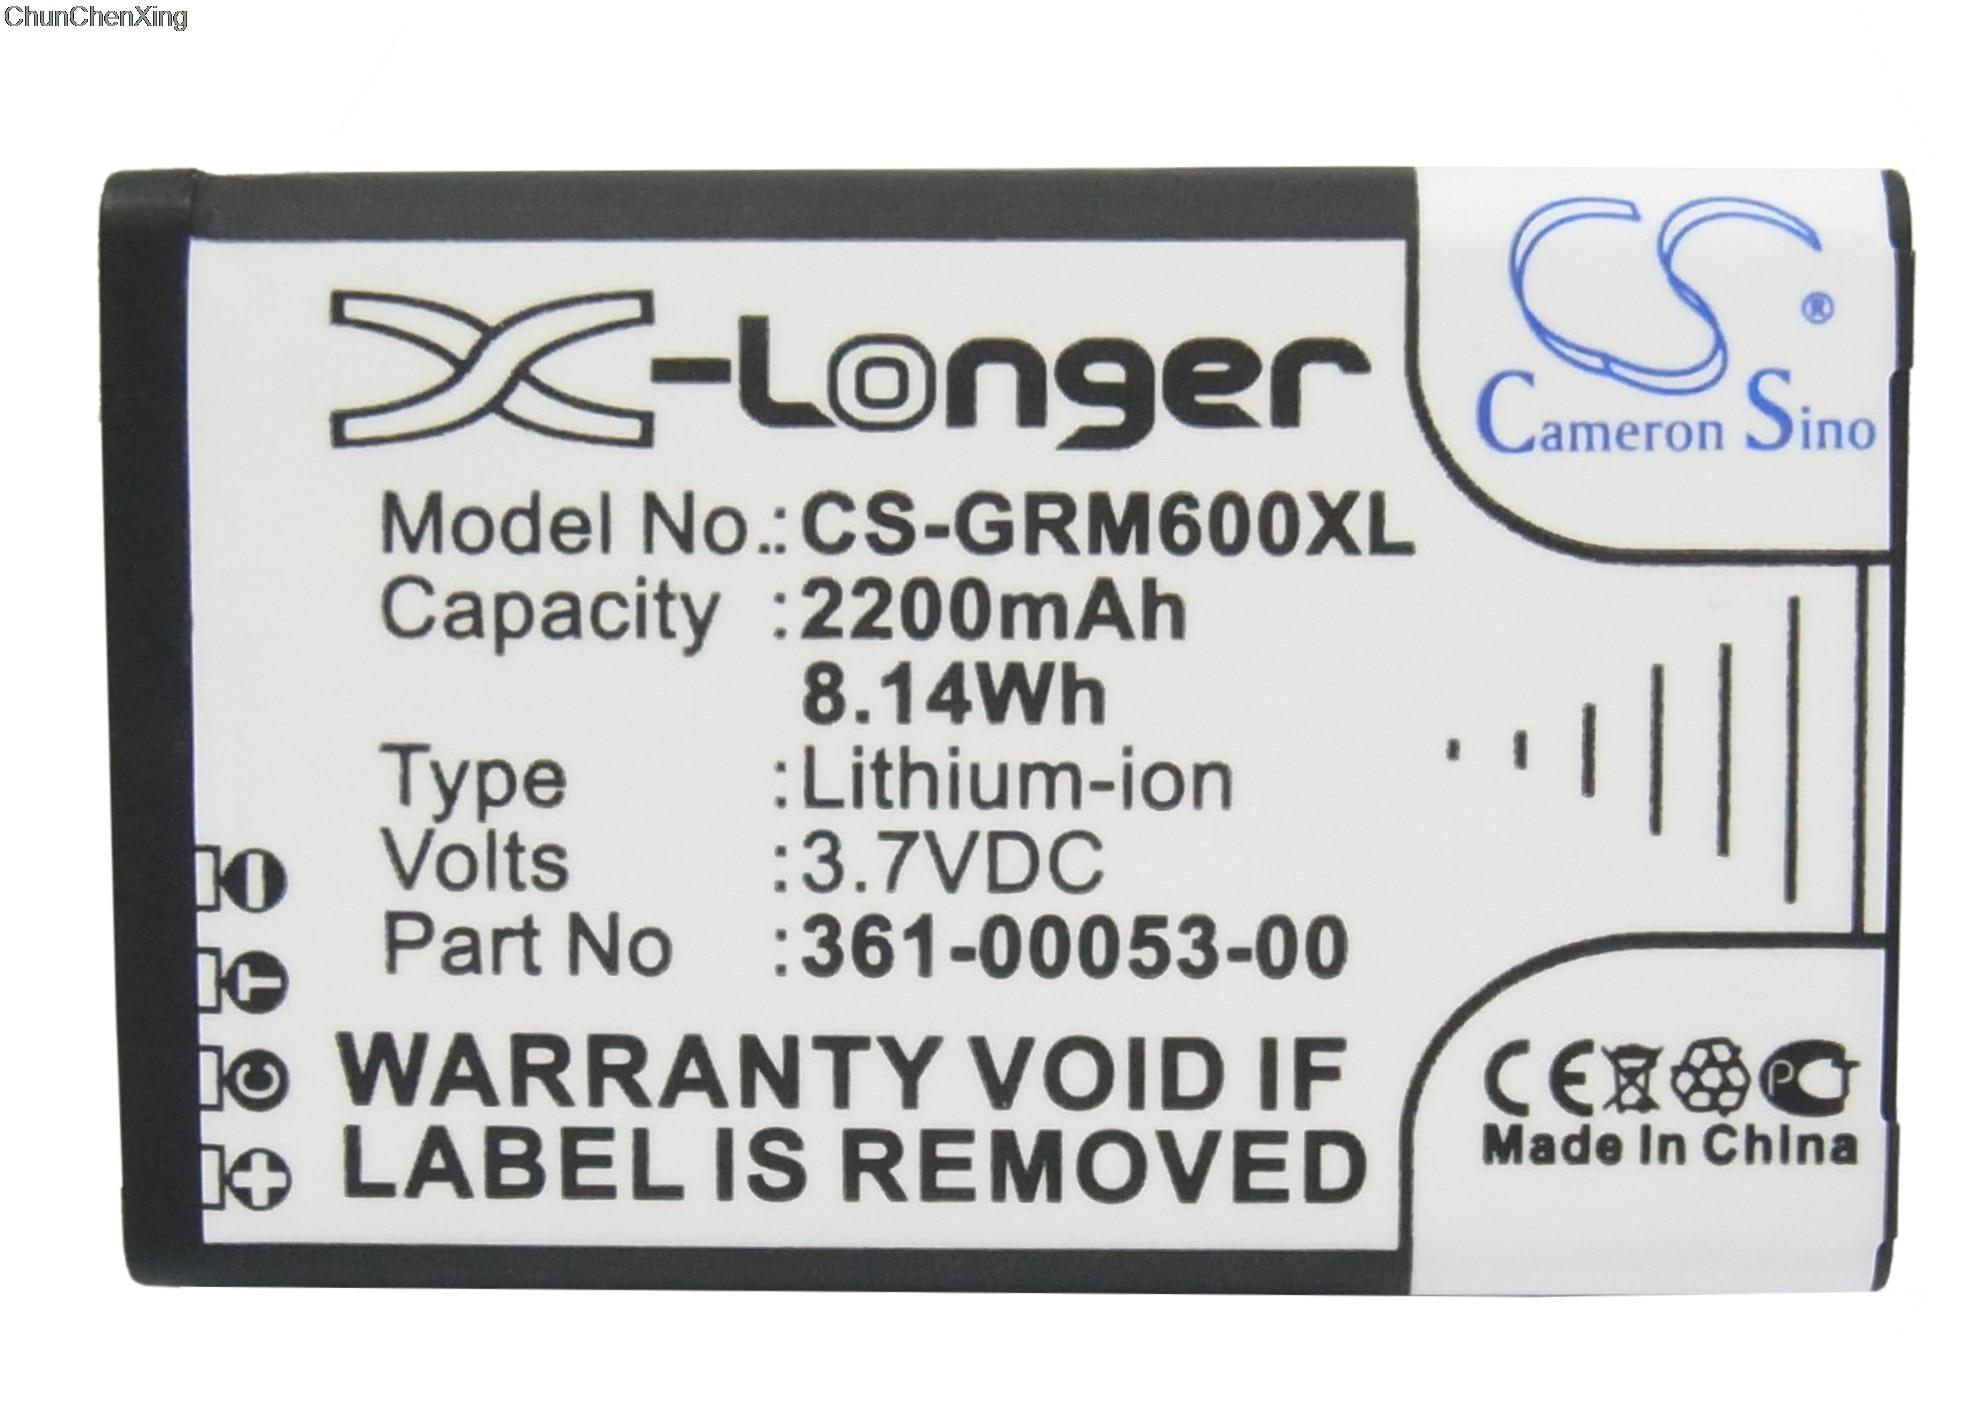 Cameron Sino 2200mAh Battery 361-00053-00 for Garmin Alpha 100 handheld, Montana 600, 600T, 600t Camo, 650, 650T,